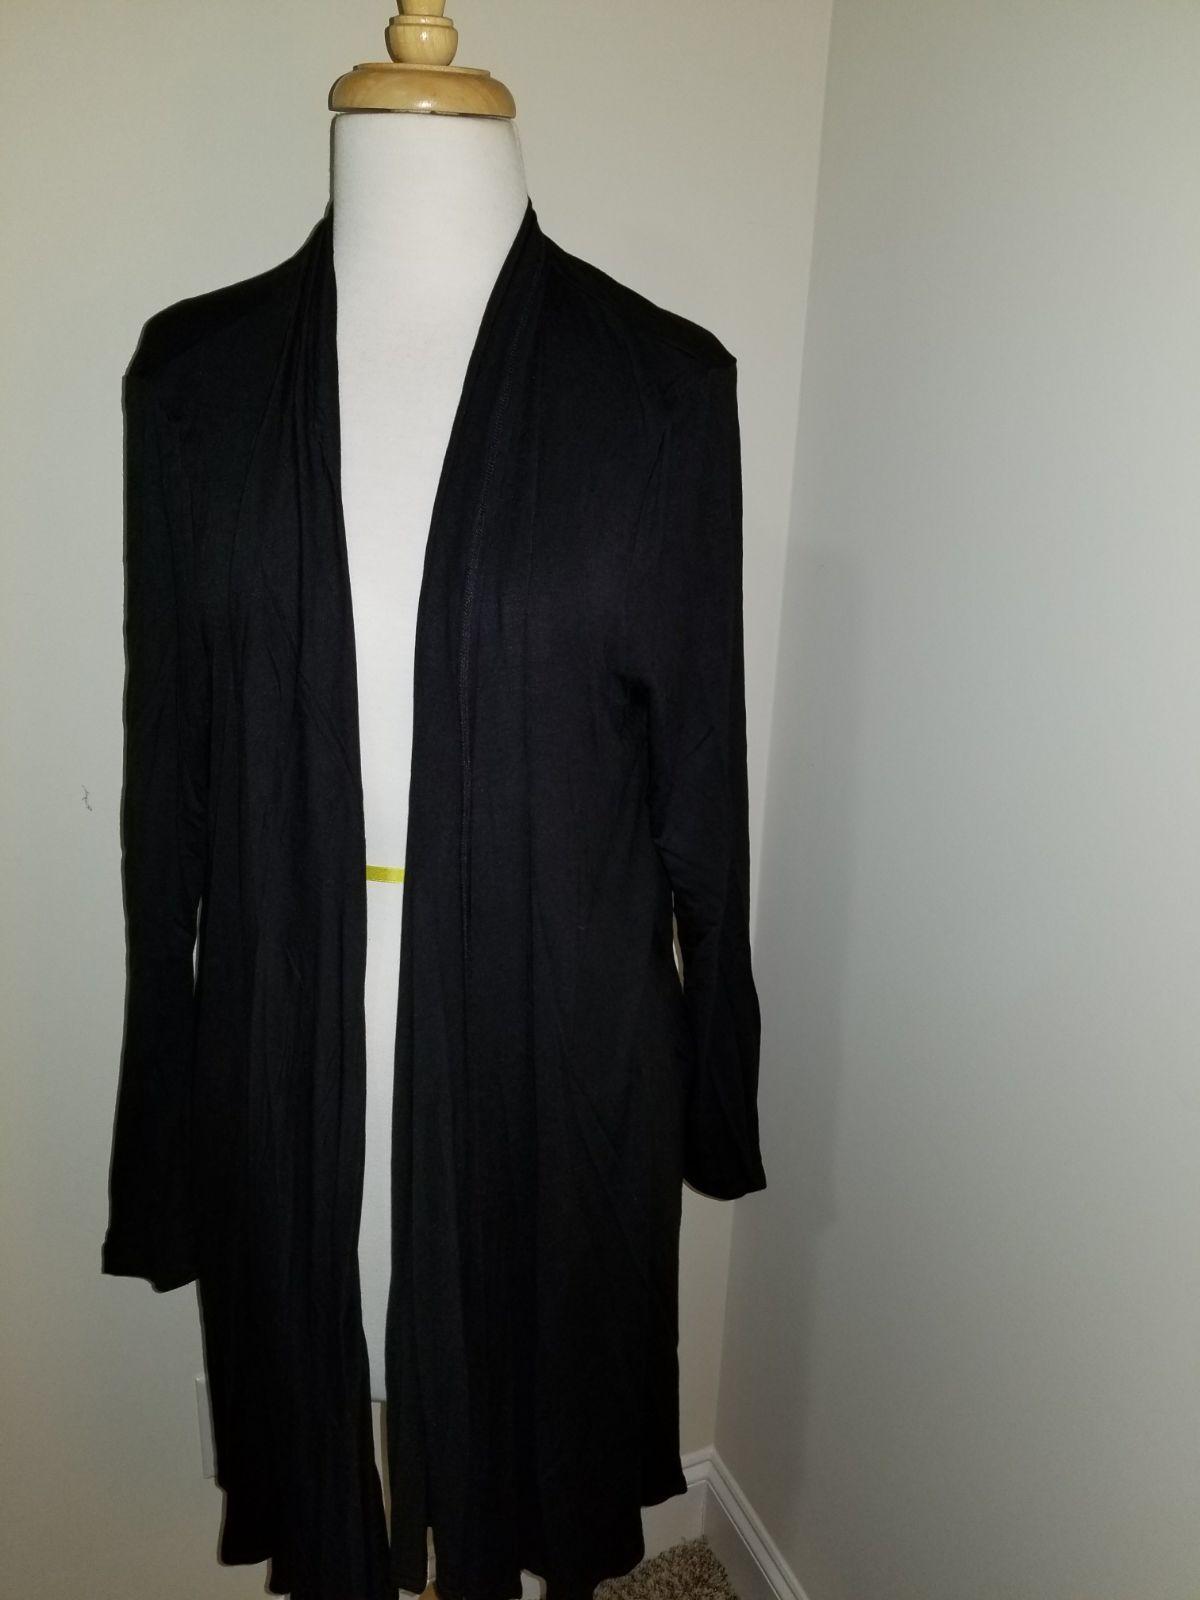 solid black cardigan - Mercari: BUY & SELL THINGS YOU LOVE